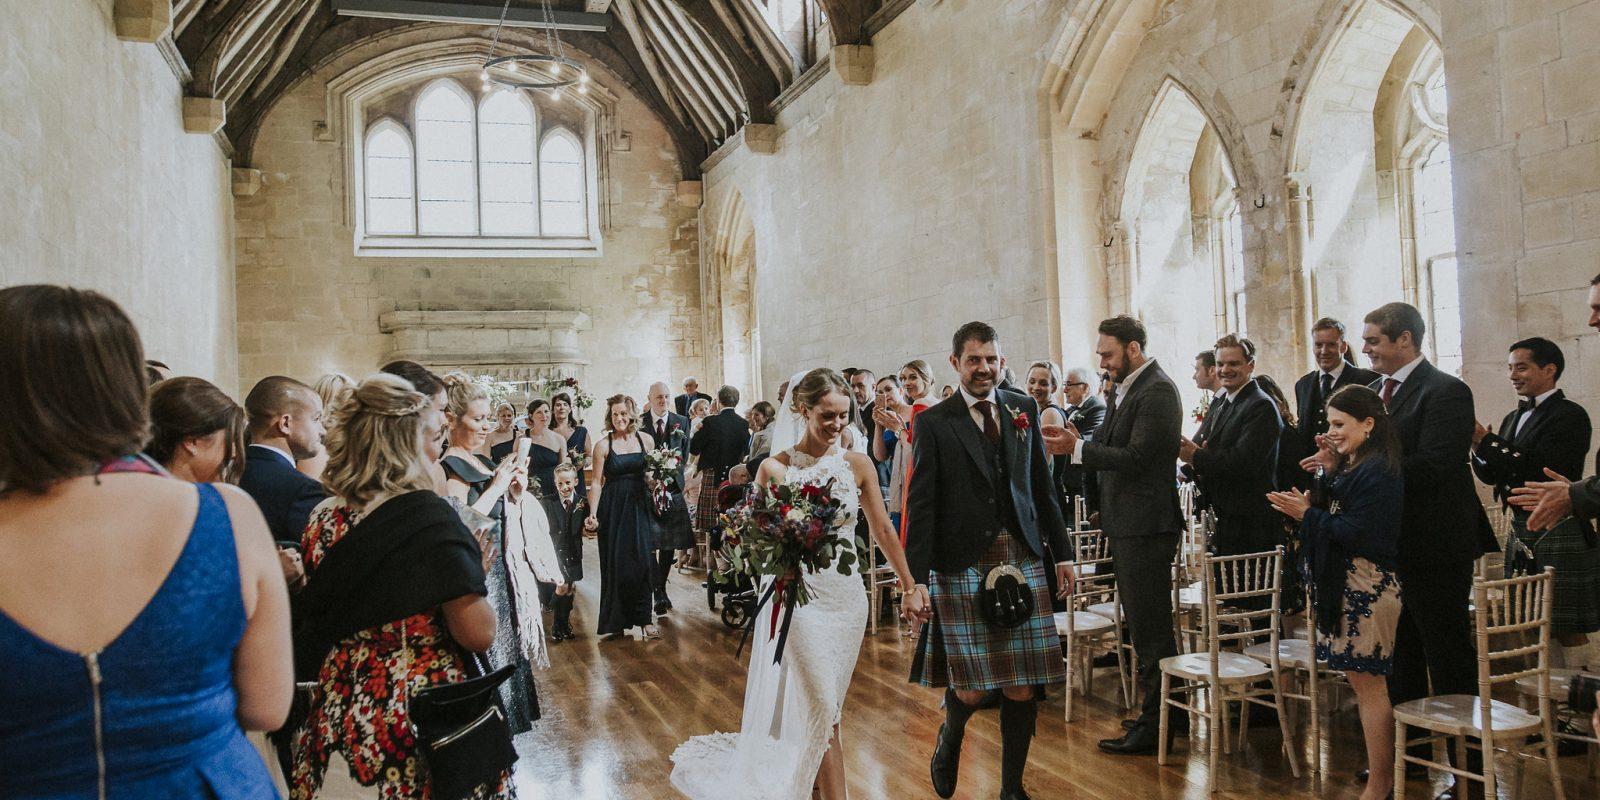 Wedding ceremony in Bradenstoke Hall